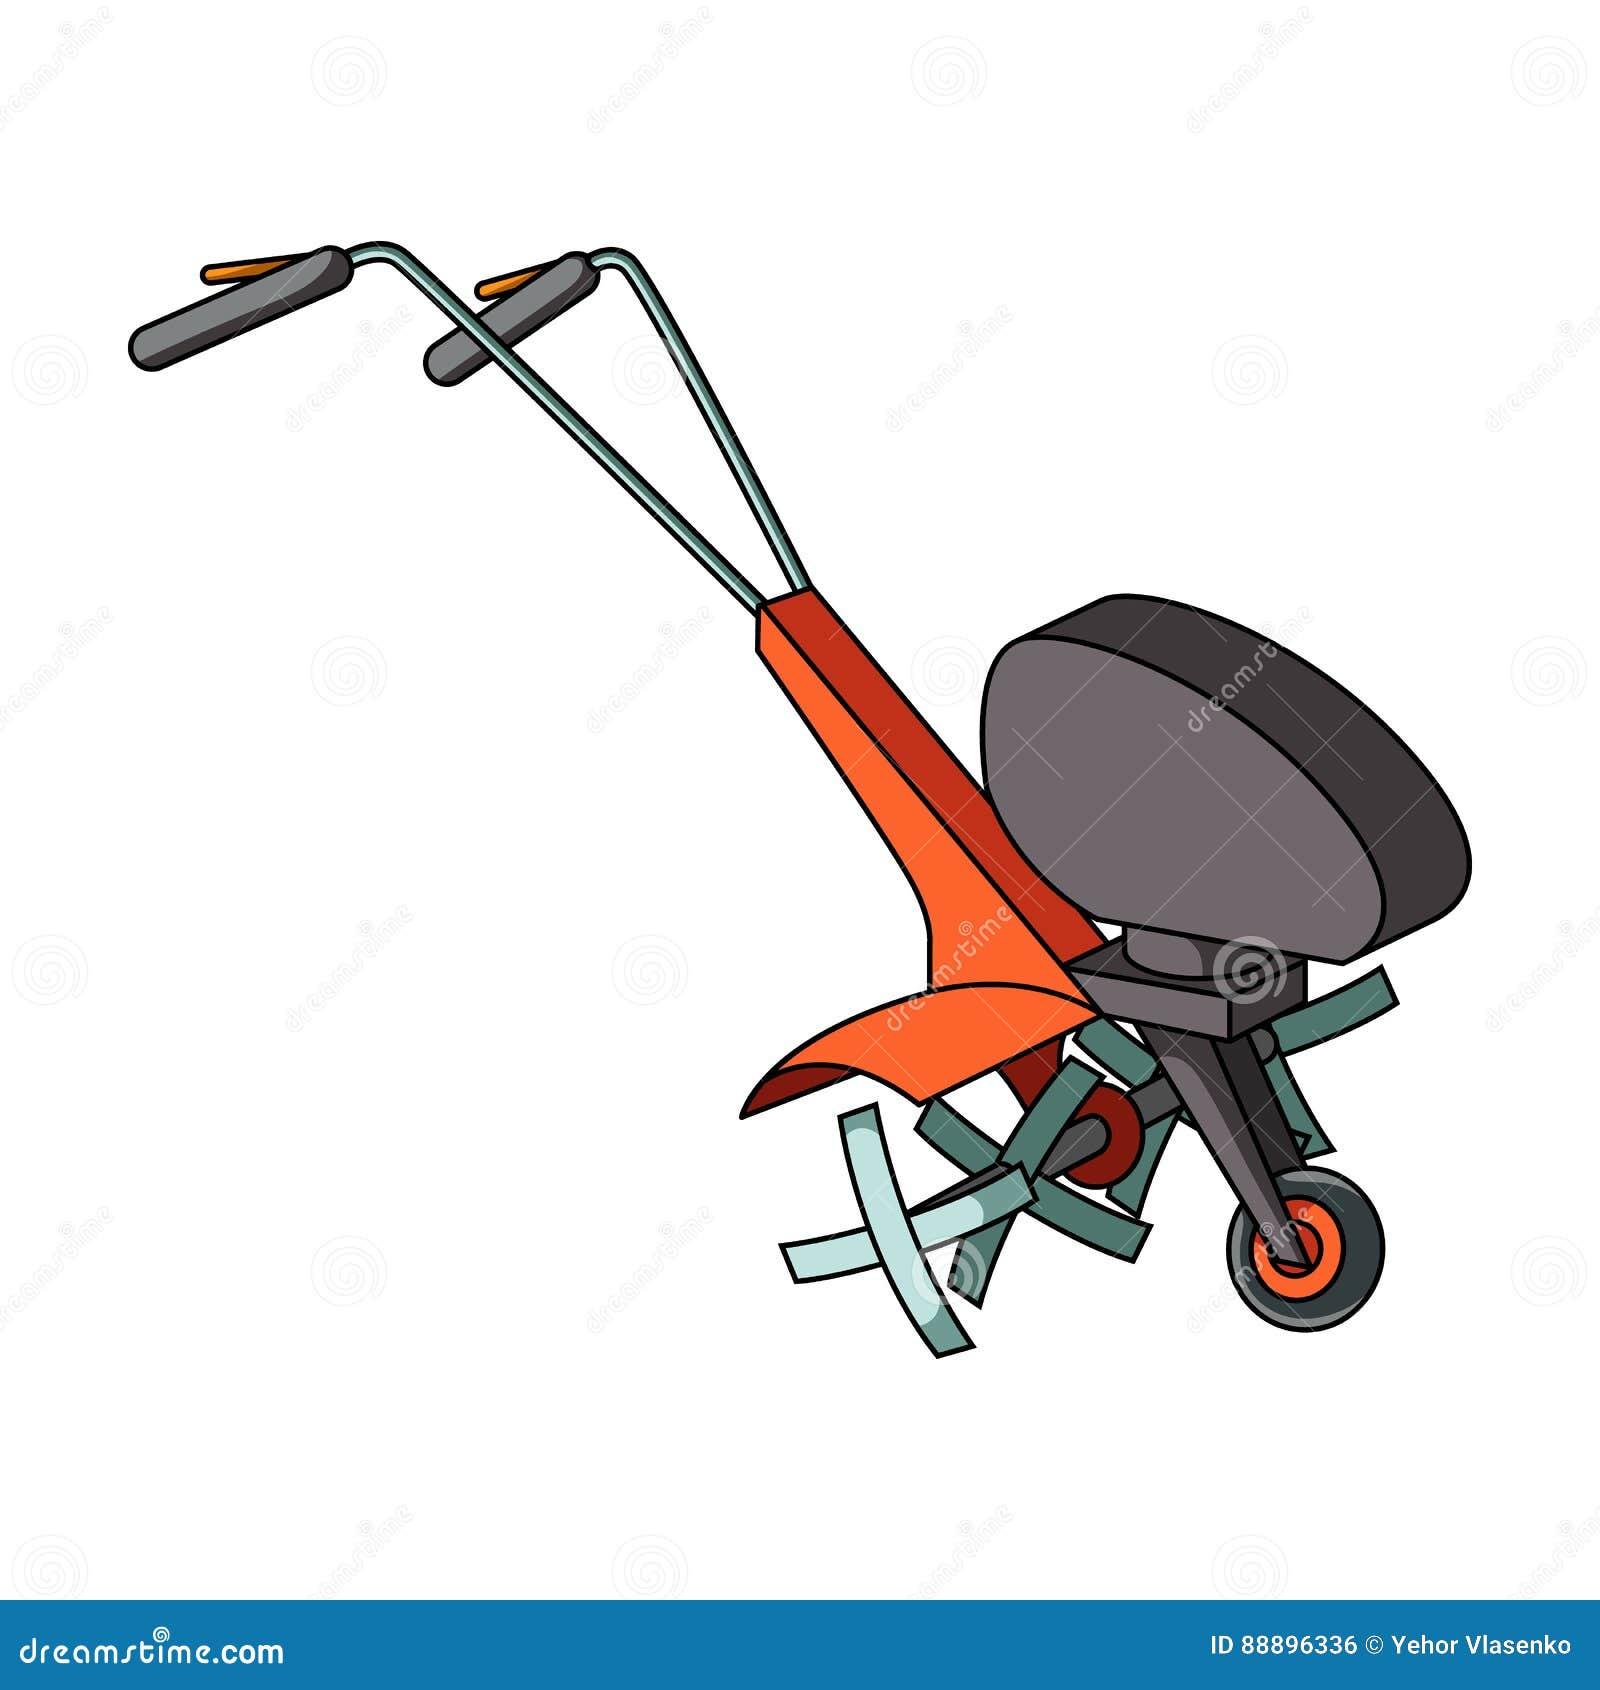 Cartoon Man On Mower : Lawn mower cutting grass cartoon bing images